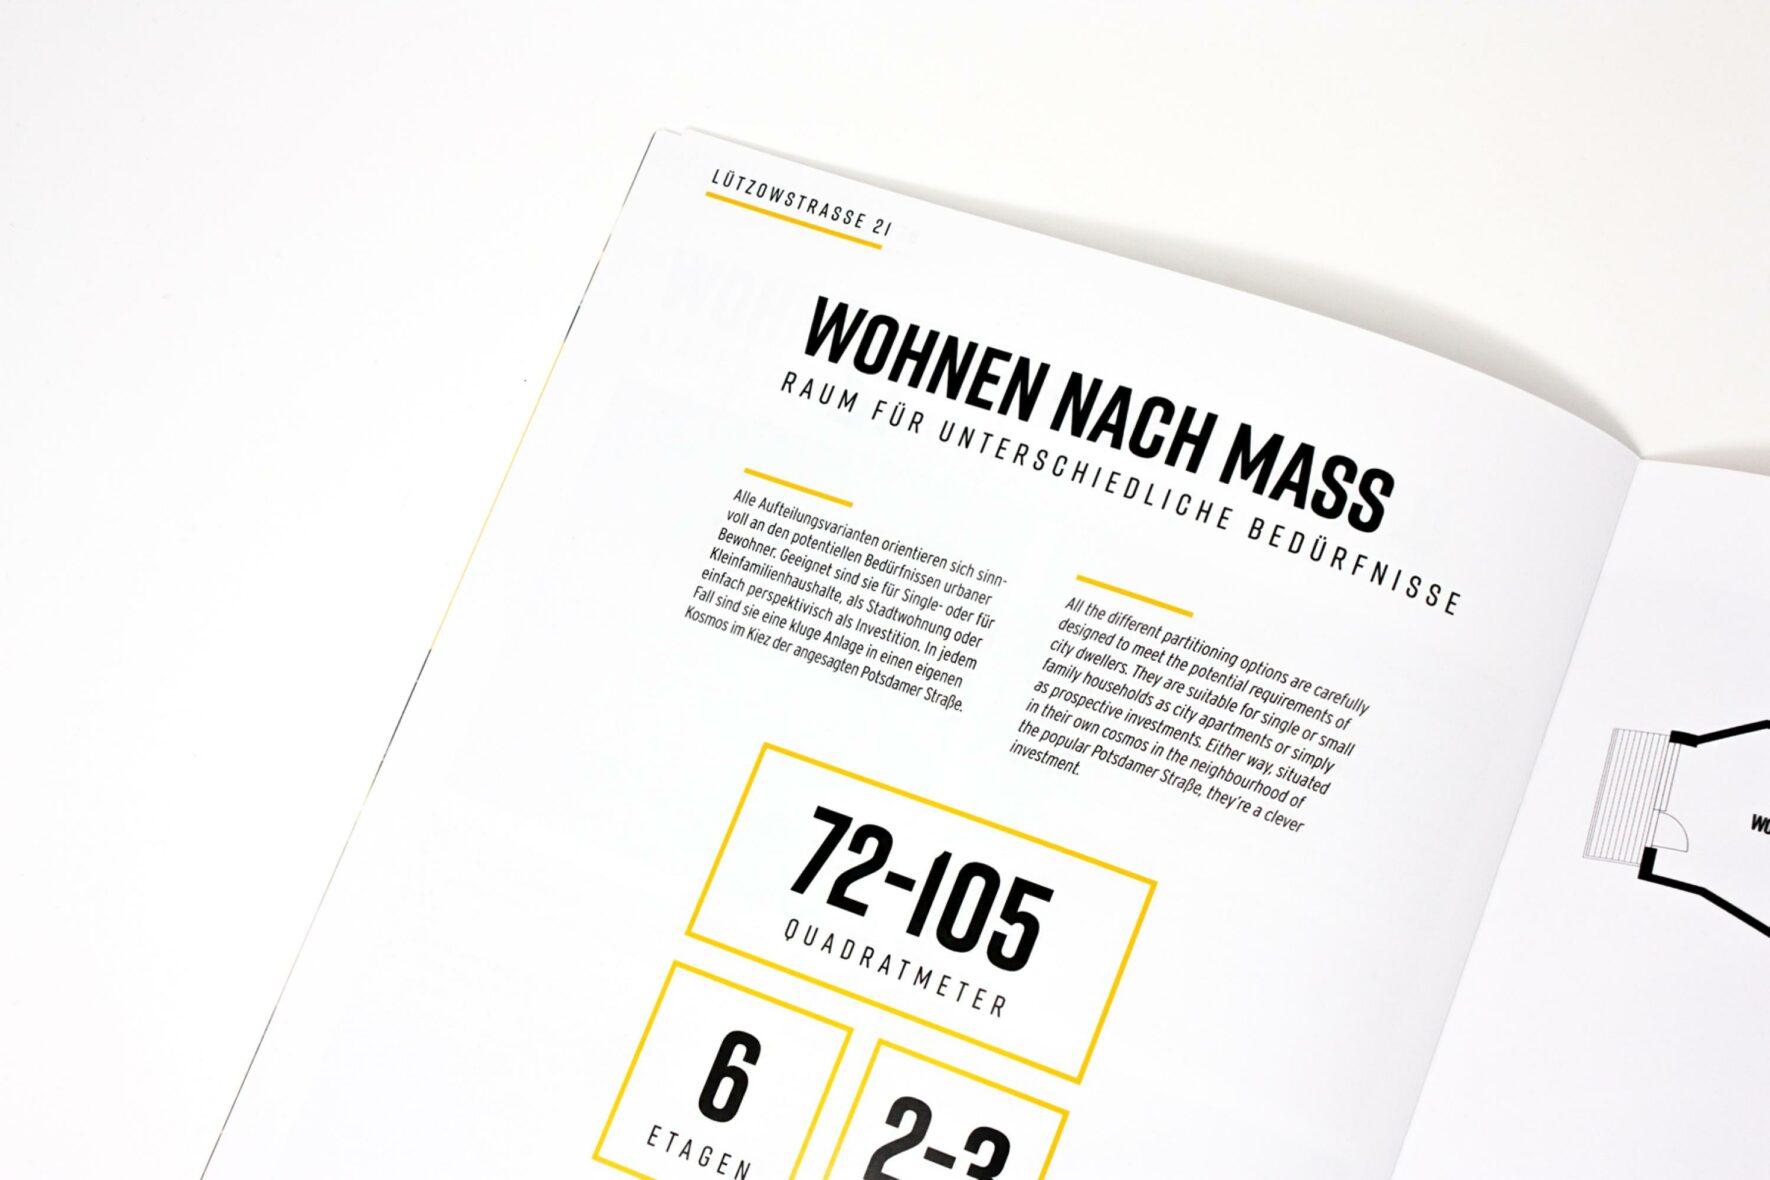 Immobilienbranding-Luetzow-Trendcity-Broschüre-FORMLOS-berlin-Print_MG_8364